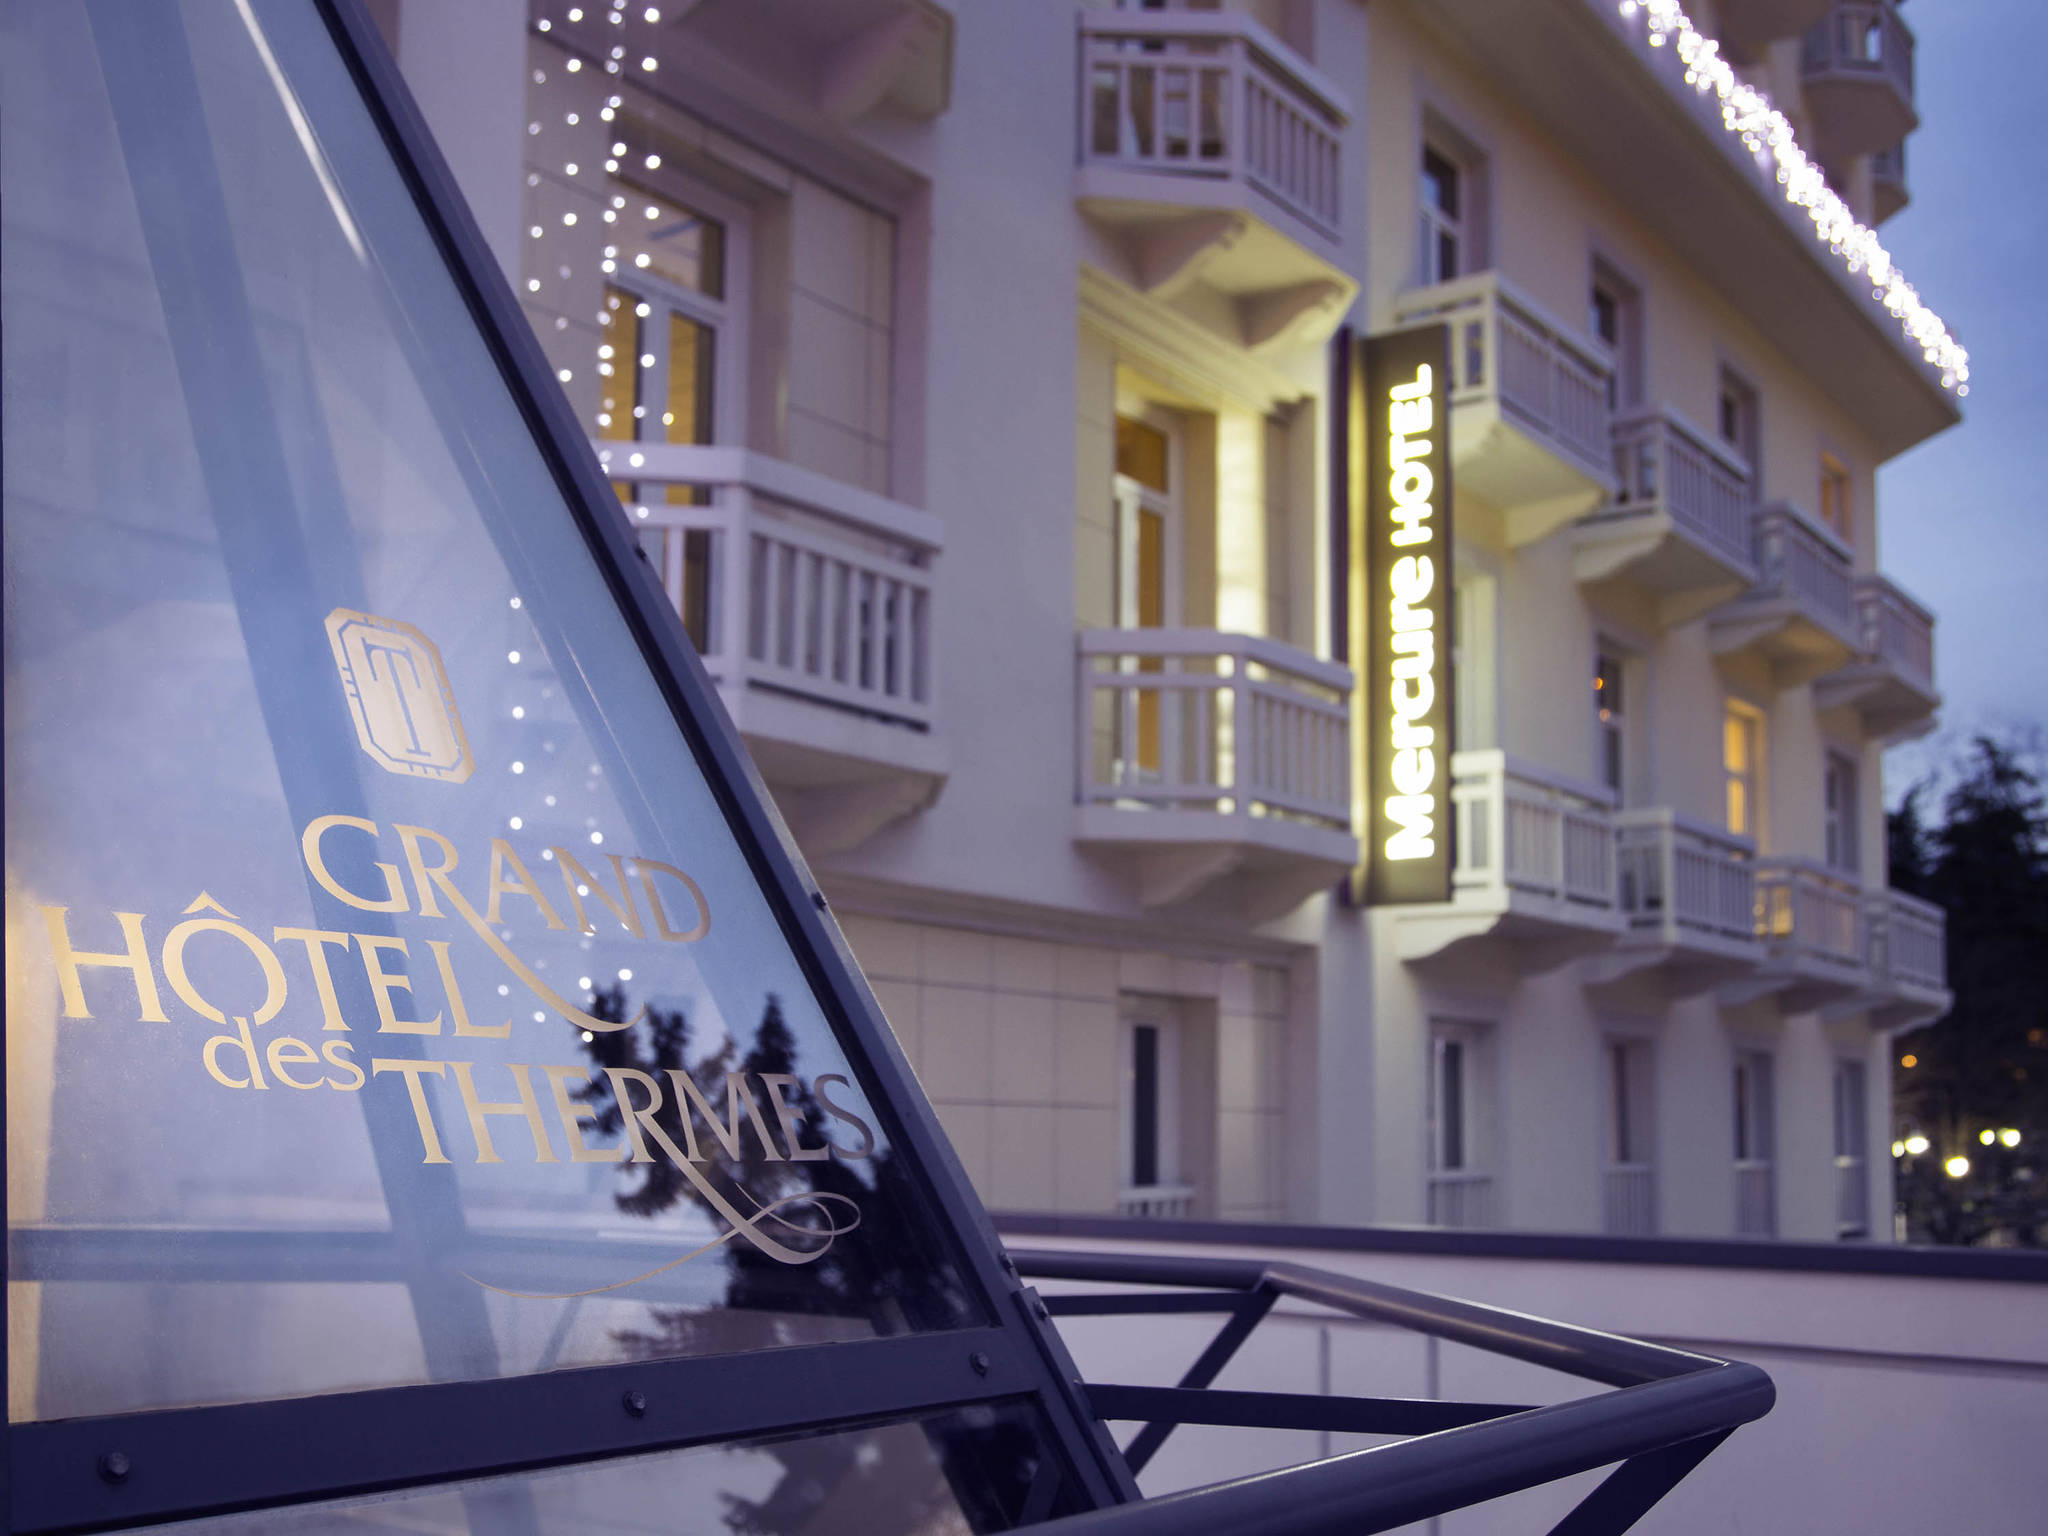 فندق - Hôtel Mercure Brides-les-Bains Grand Hôtel des Thermes